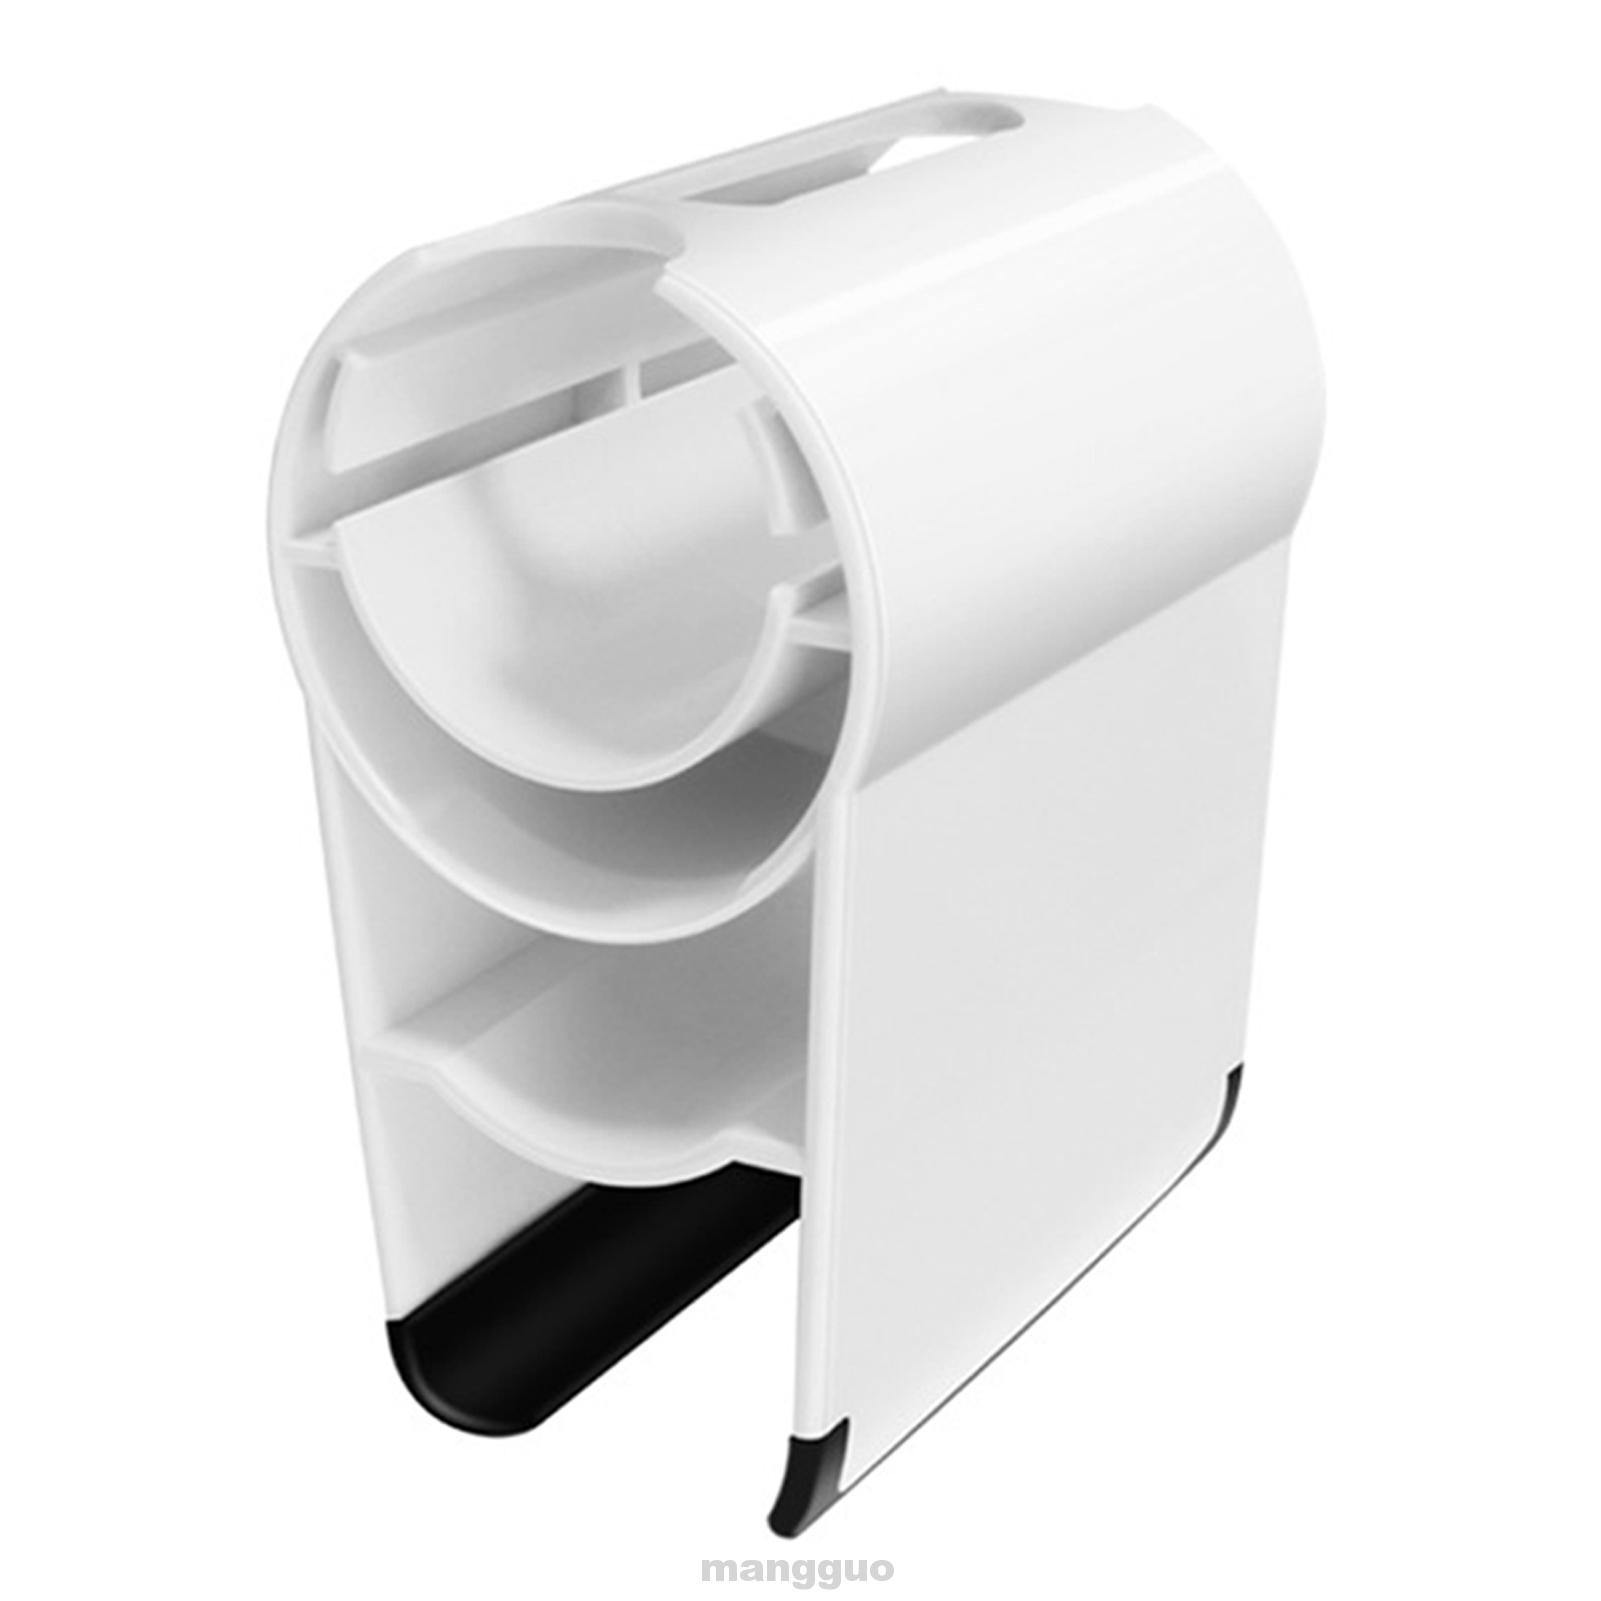 DYSON 附件夾家用工具耐用噴嘴底座, 用於戴森 V7 V8 V10 V11